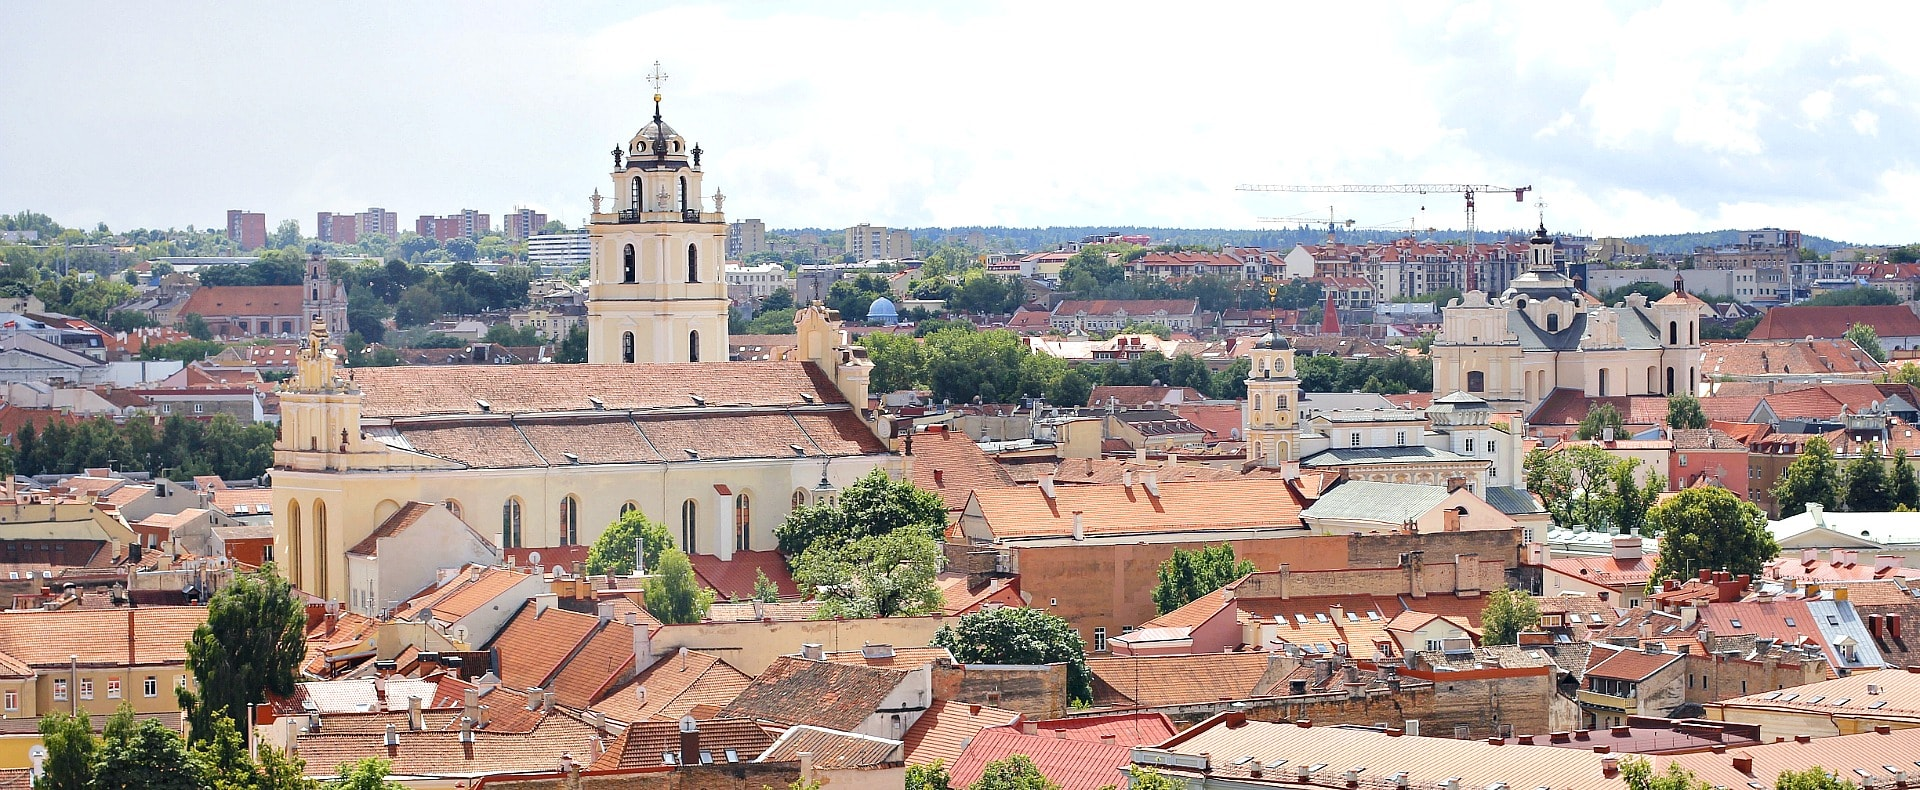 Vilnius City Gallery